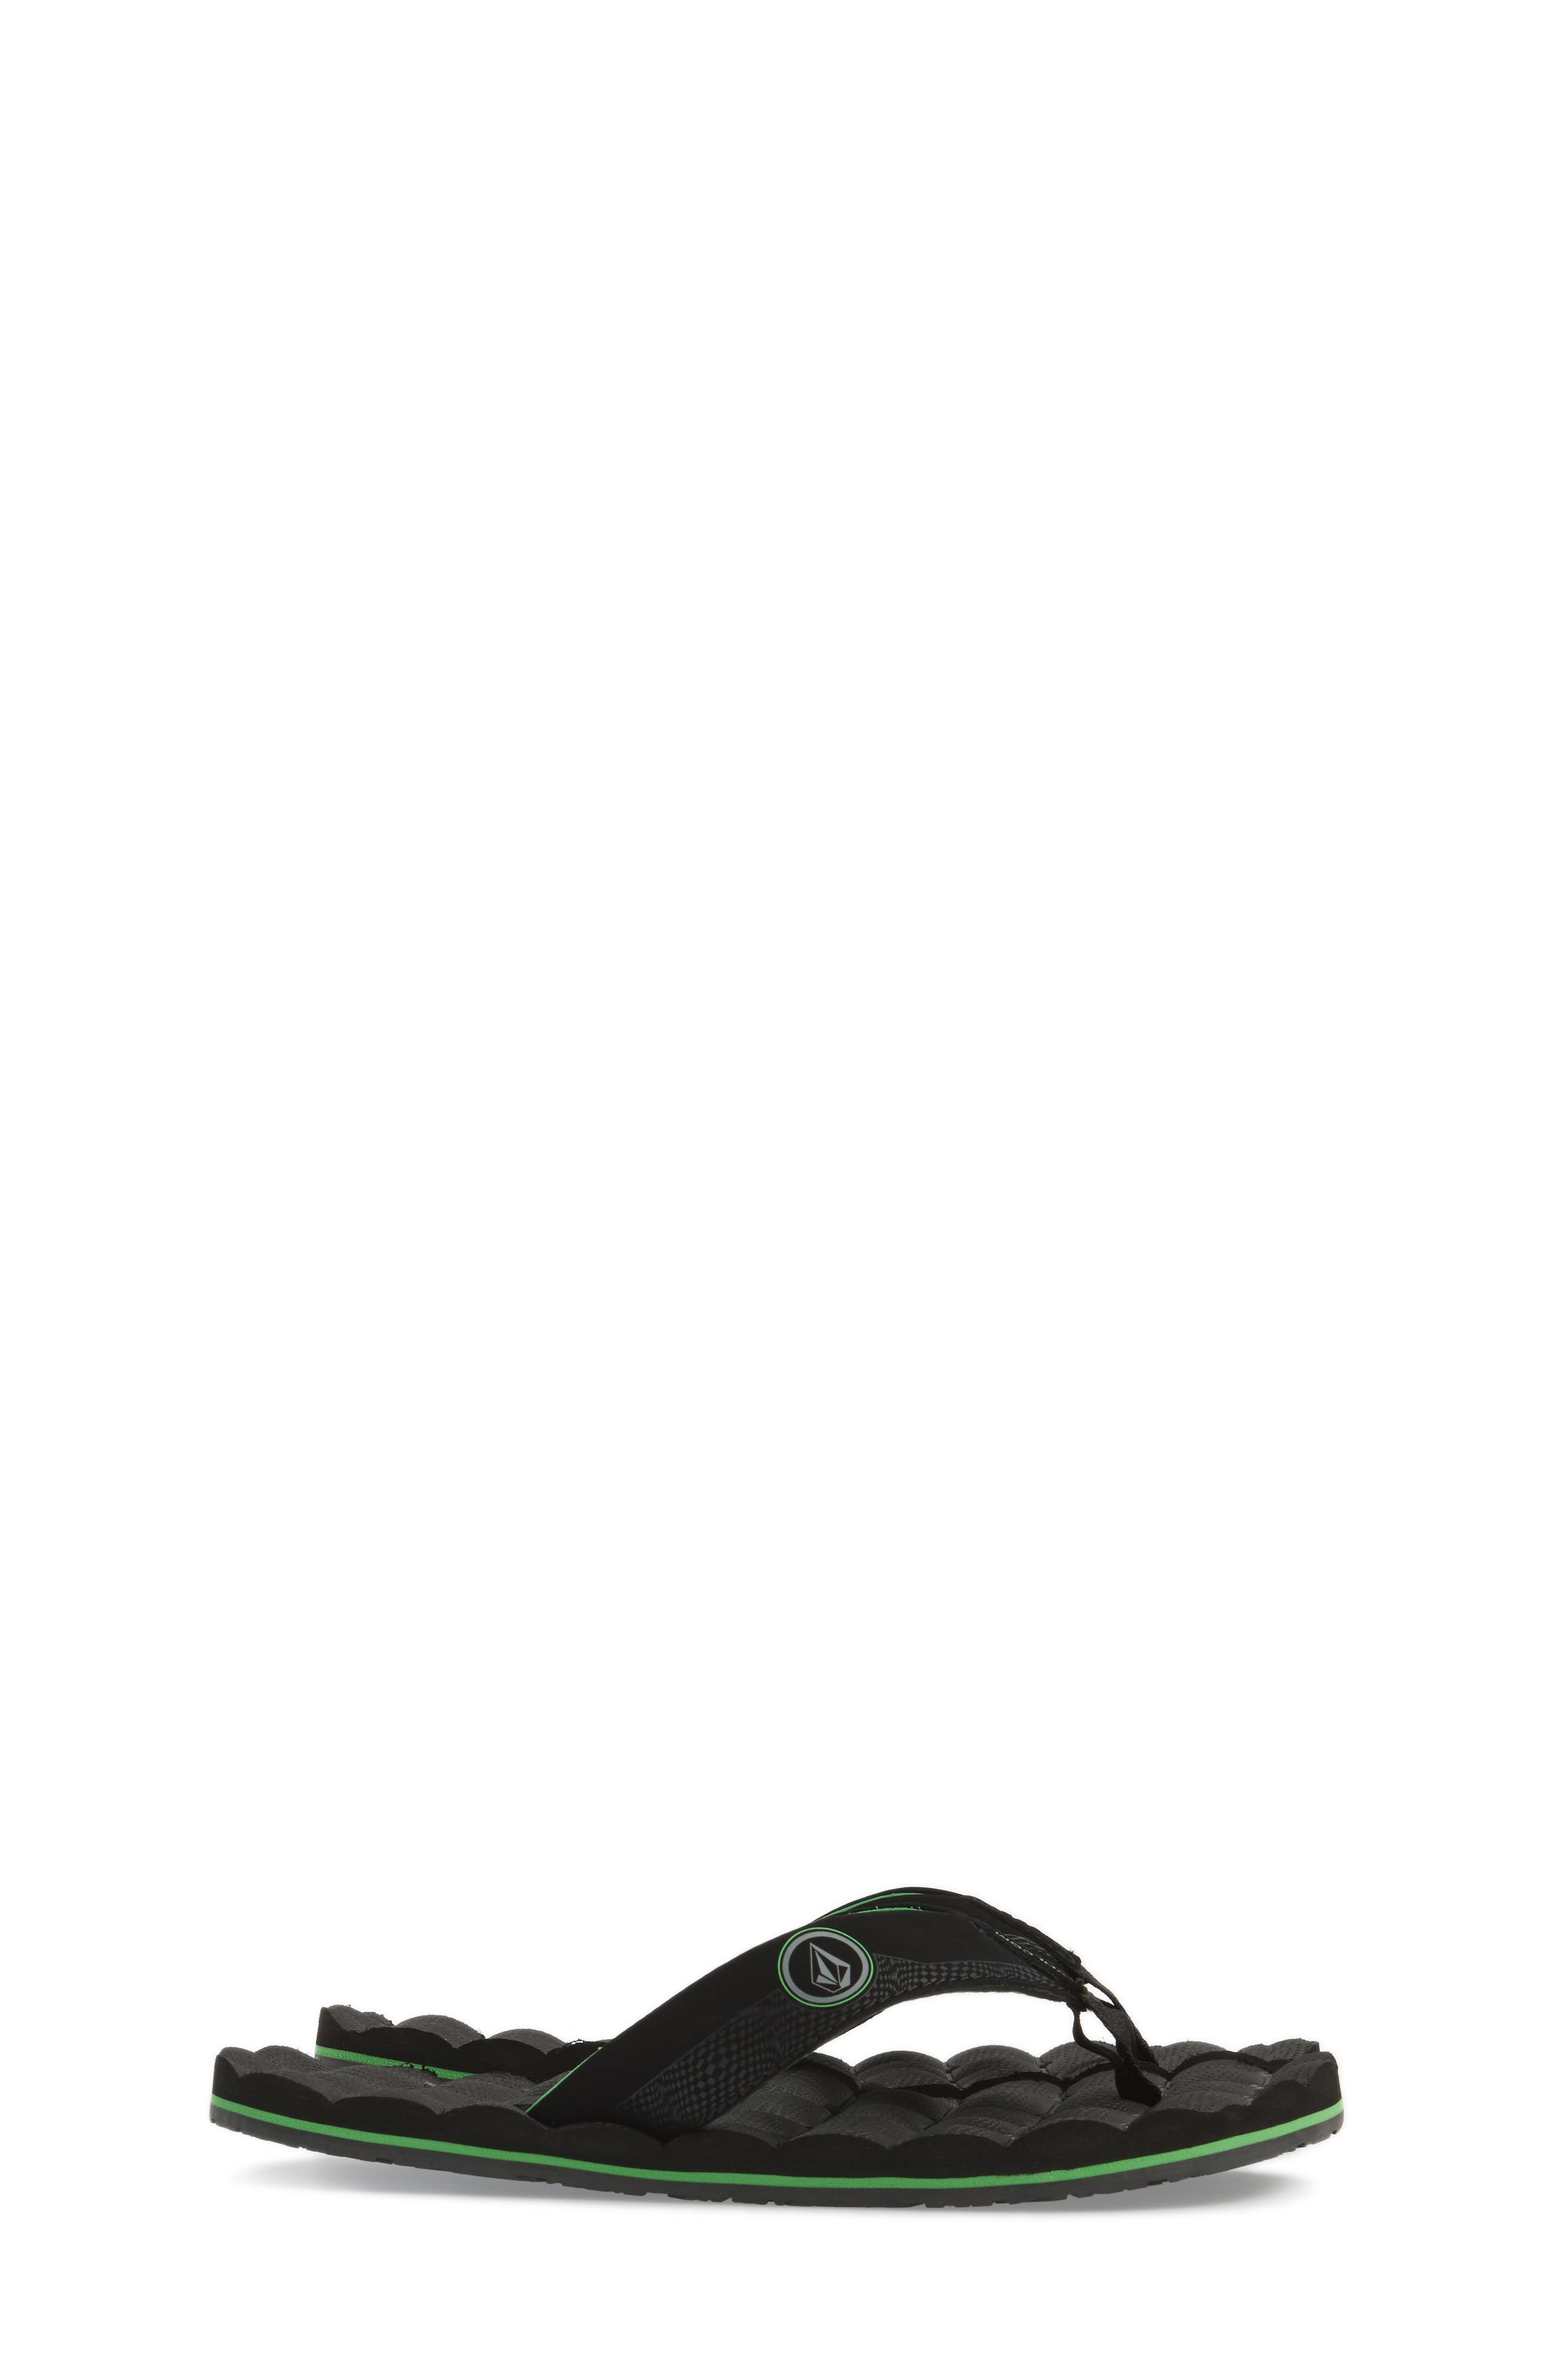 Alternate Image 3  - Volcom Recliner Flip Flop (Little Kid & Big Kid)